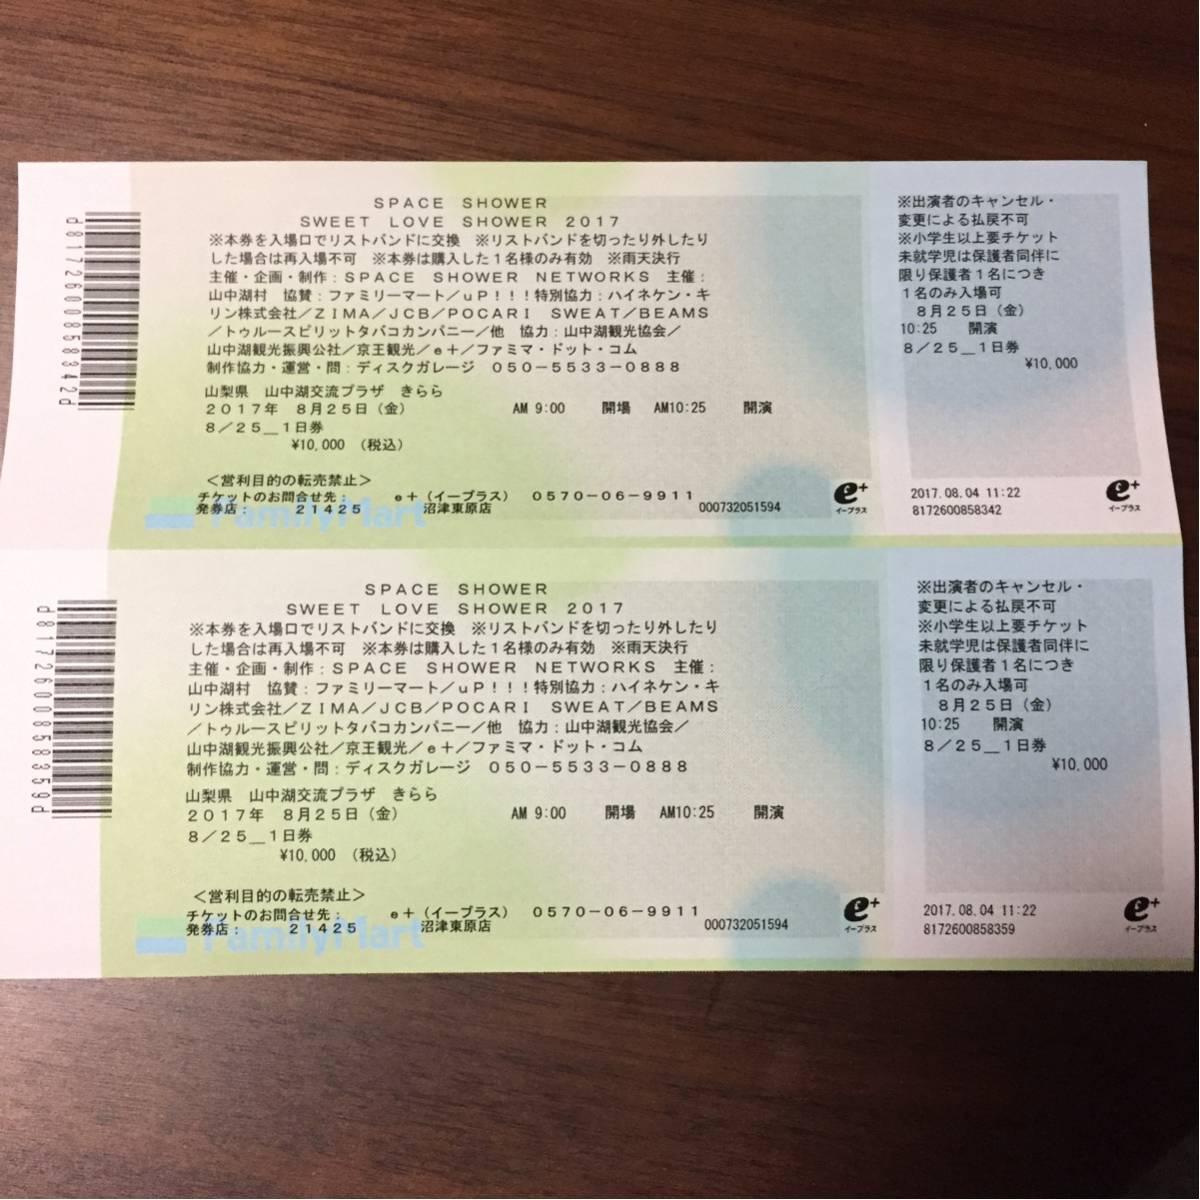 SWEET LOVE SHOWER 2017★8/25(金) 1日券 2枚 入場券のみ ラブシャ